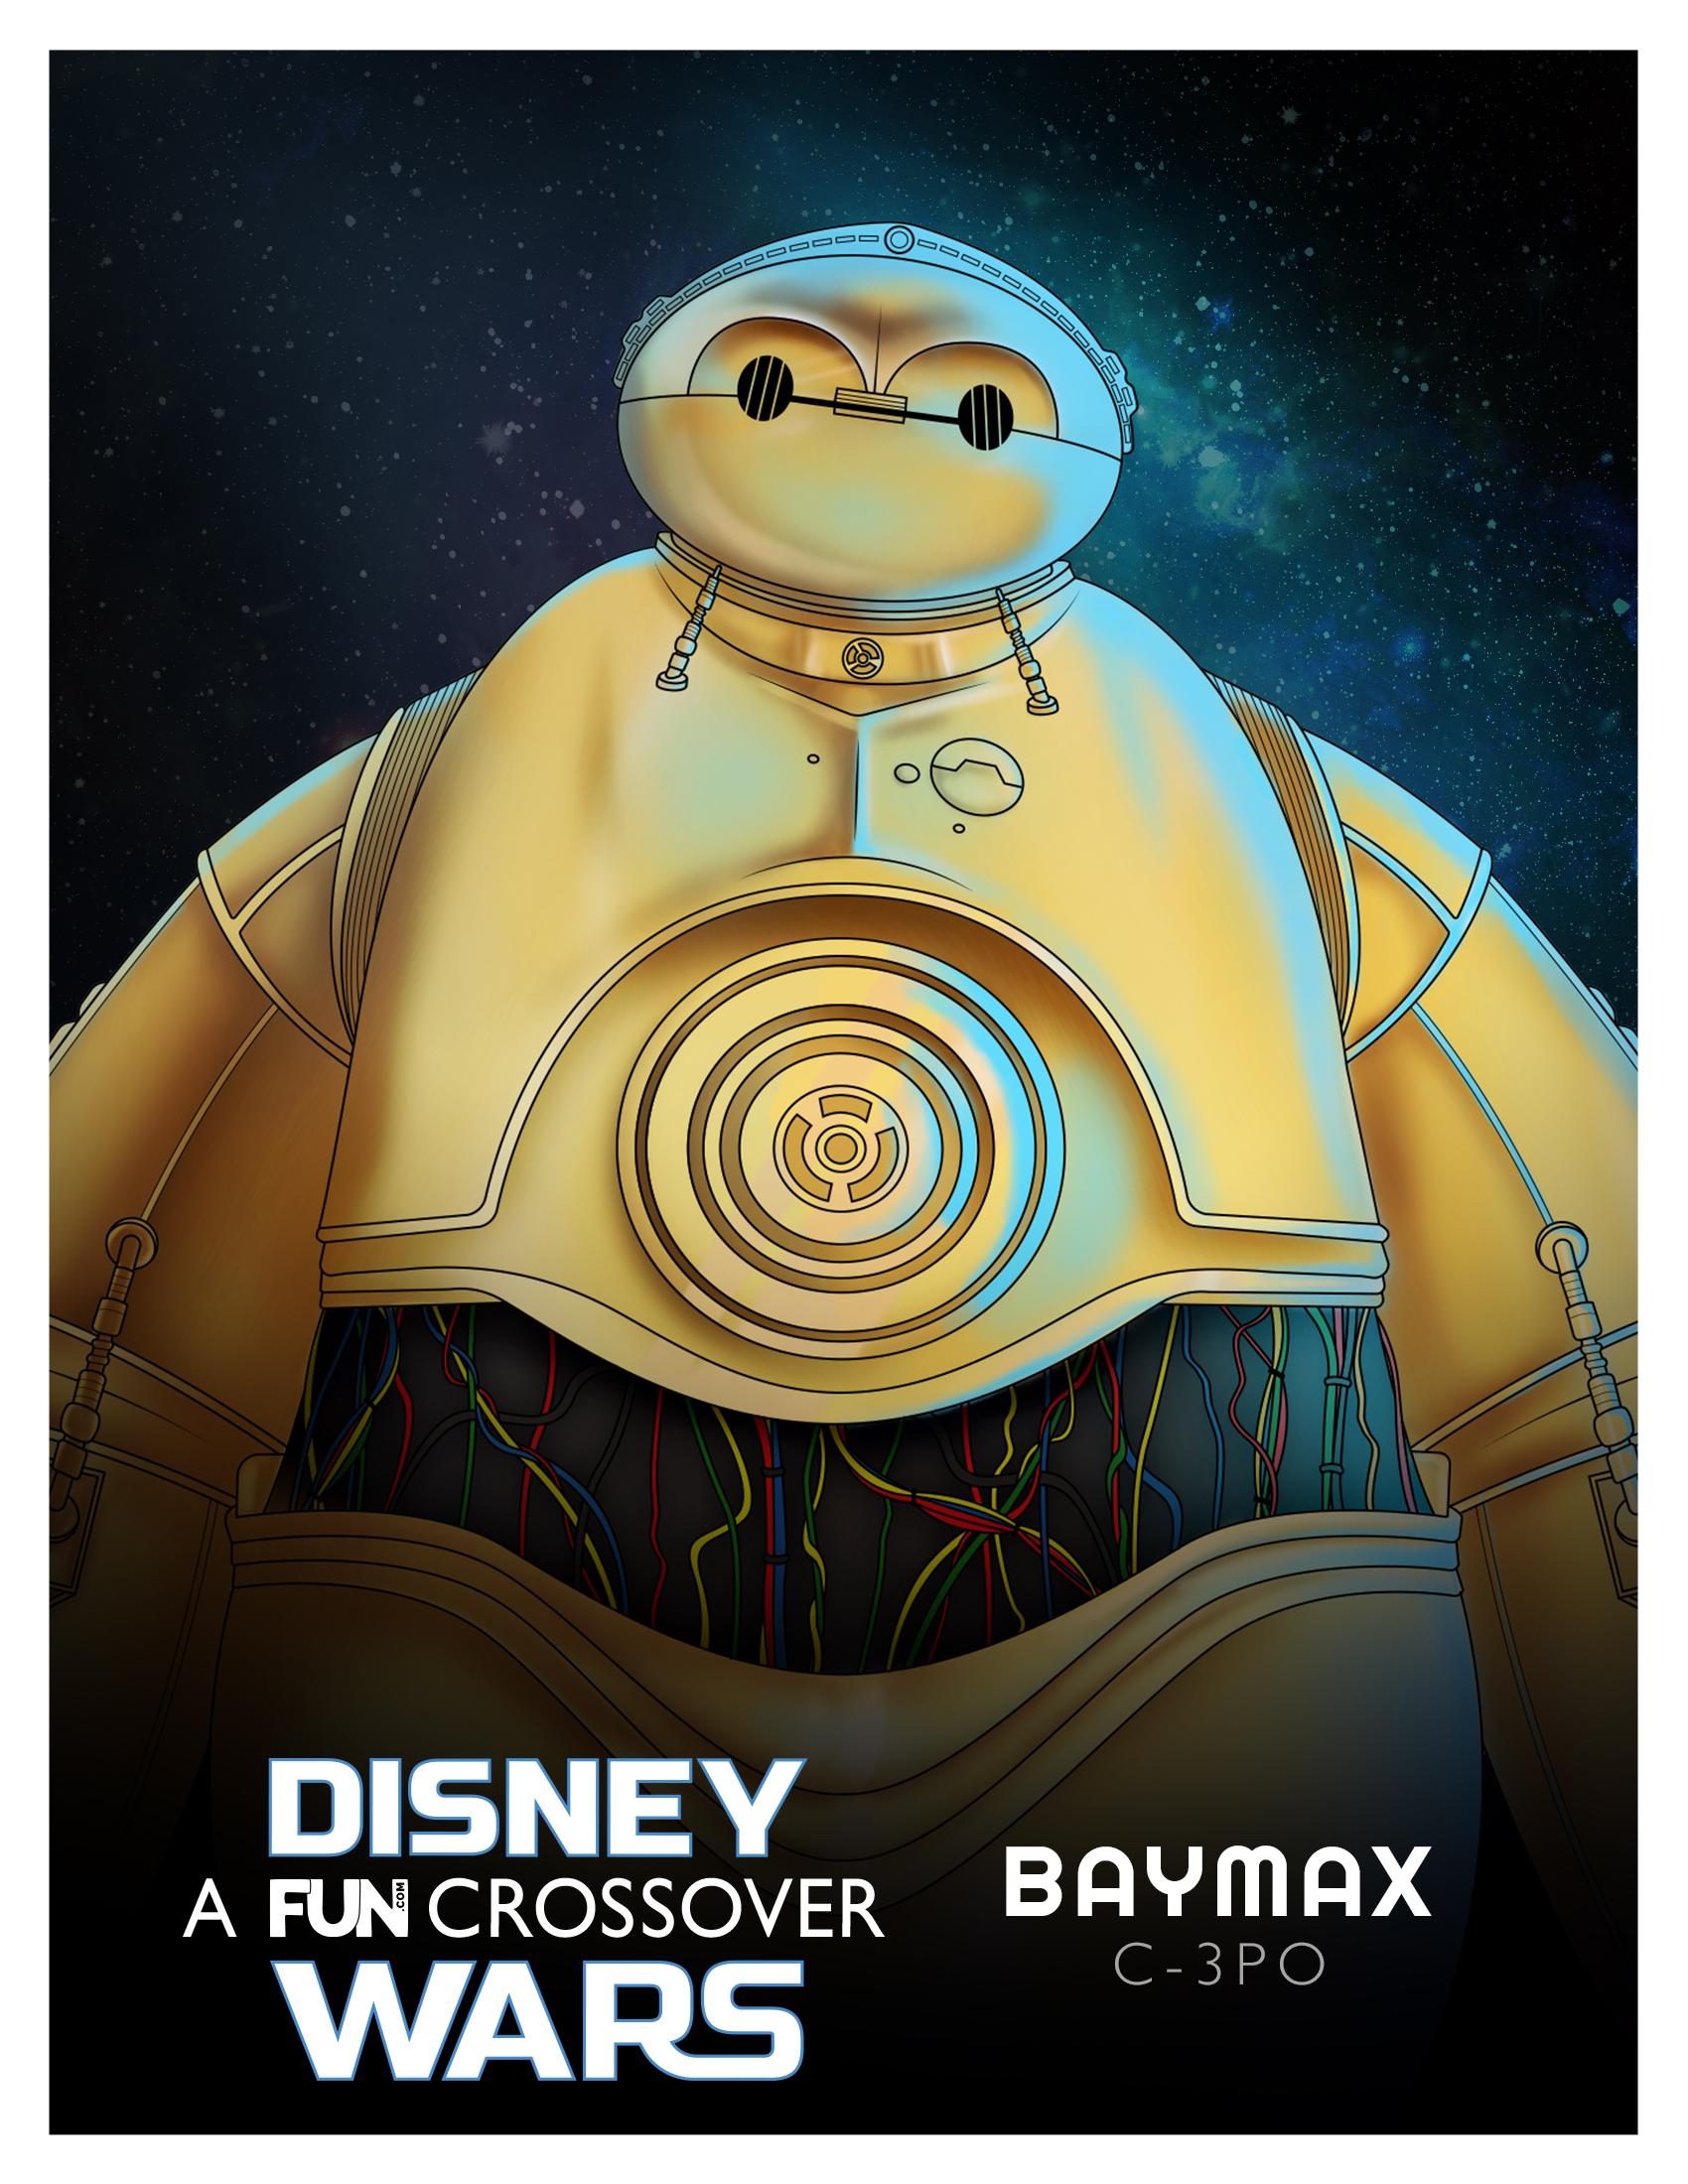 Disney Wars Baymax C-3PO